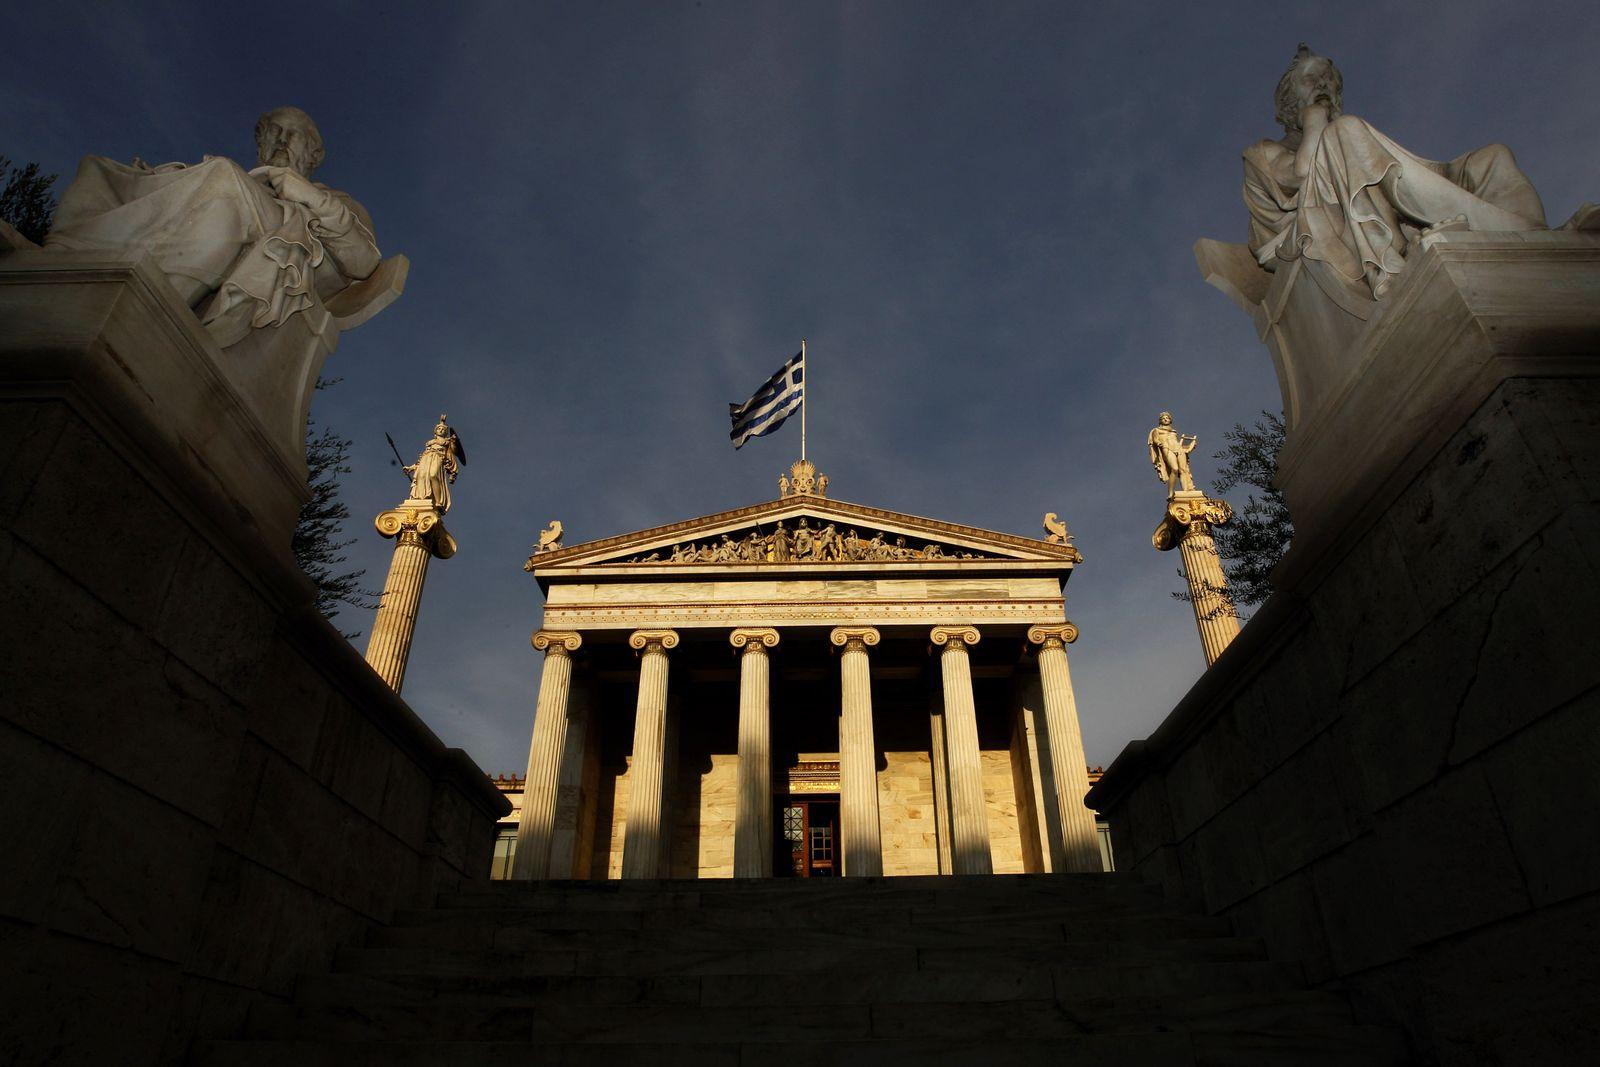 Griechenland / Statuen